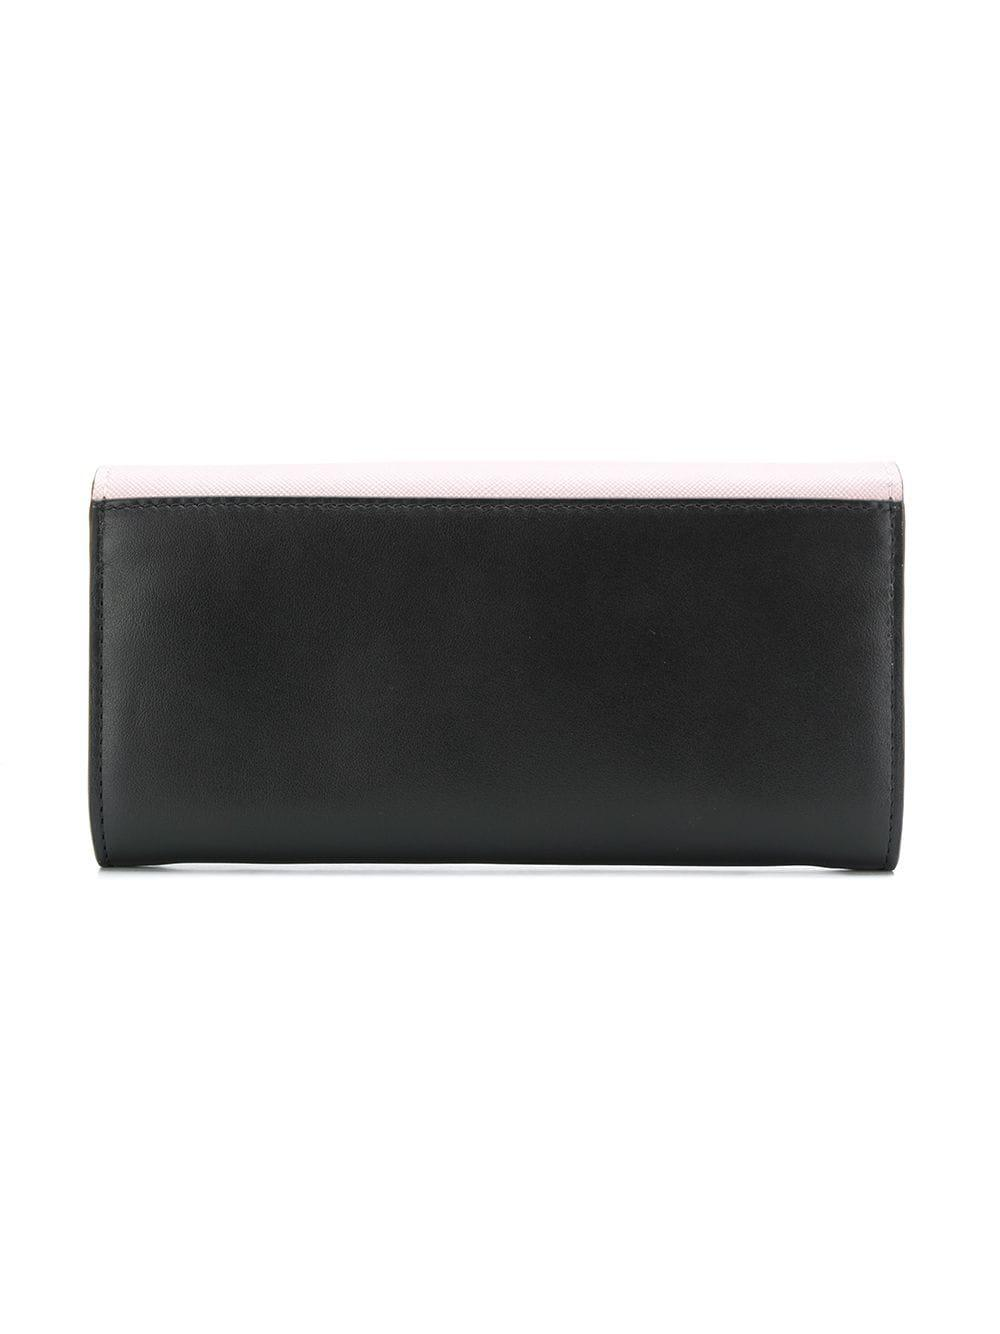 06ddcd4c058e Lyst - Marni Classic Wallet in Black